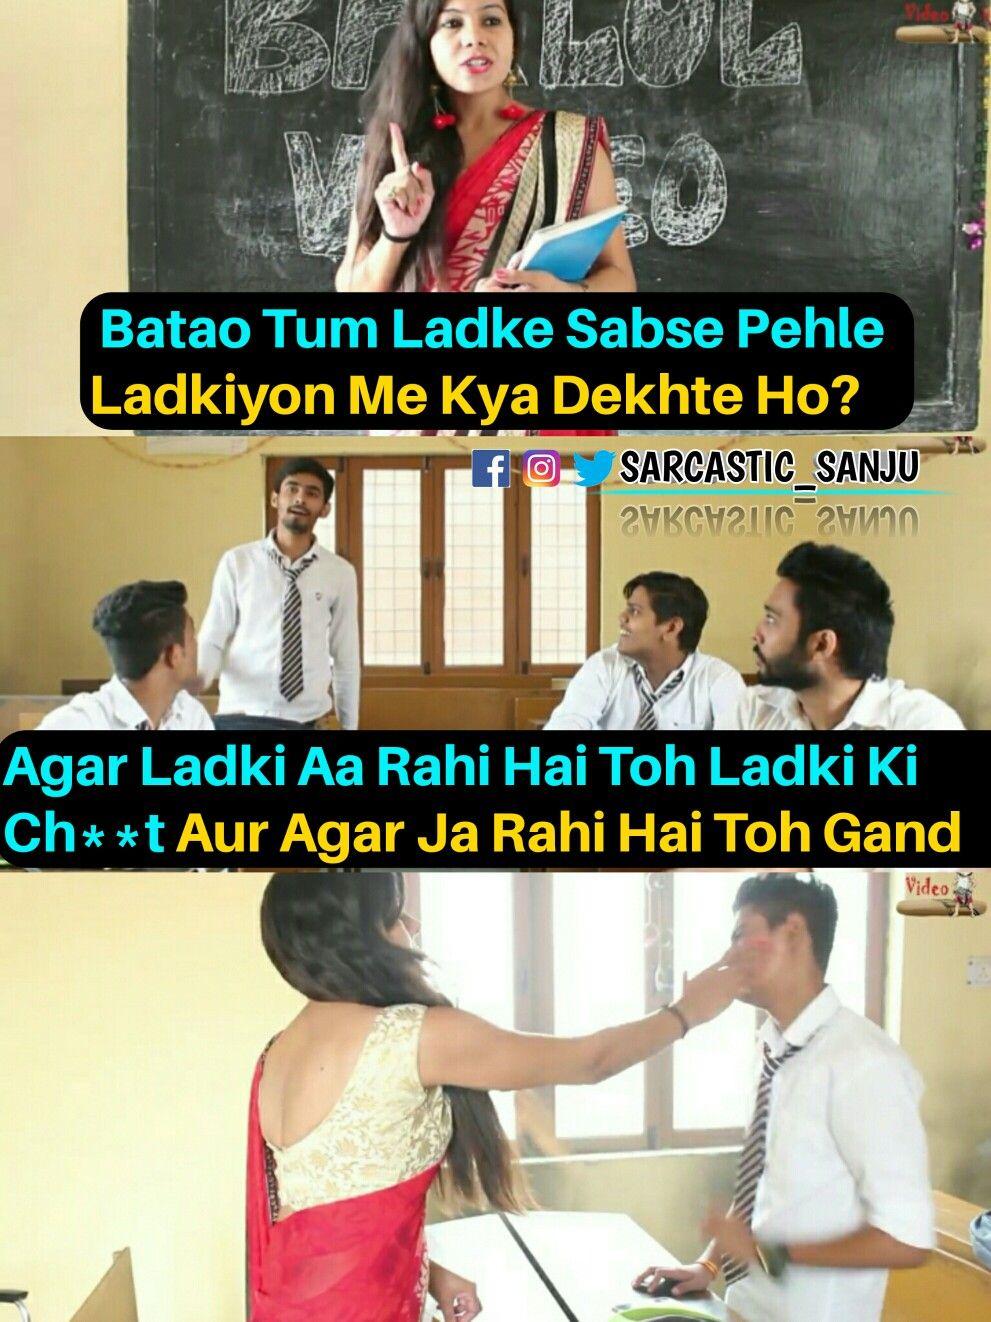 Teacher Student Fun Jokes Images Best Funny Jokes Some Funny Jokes